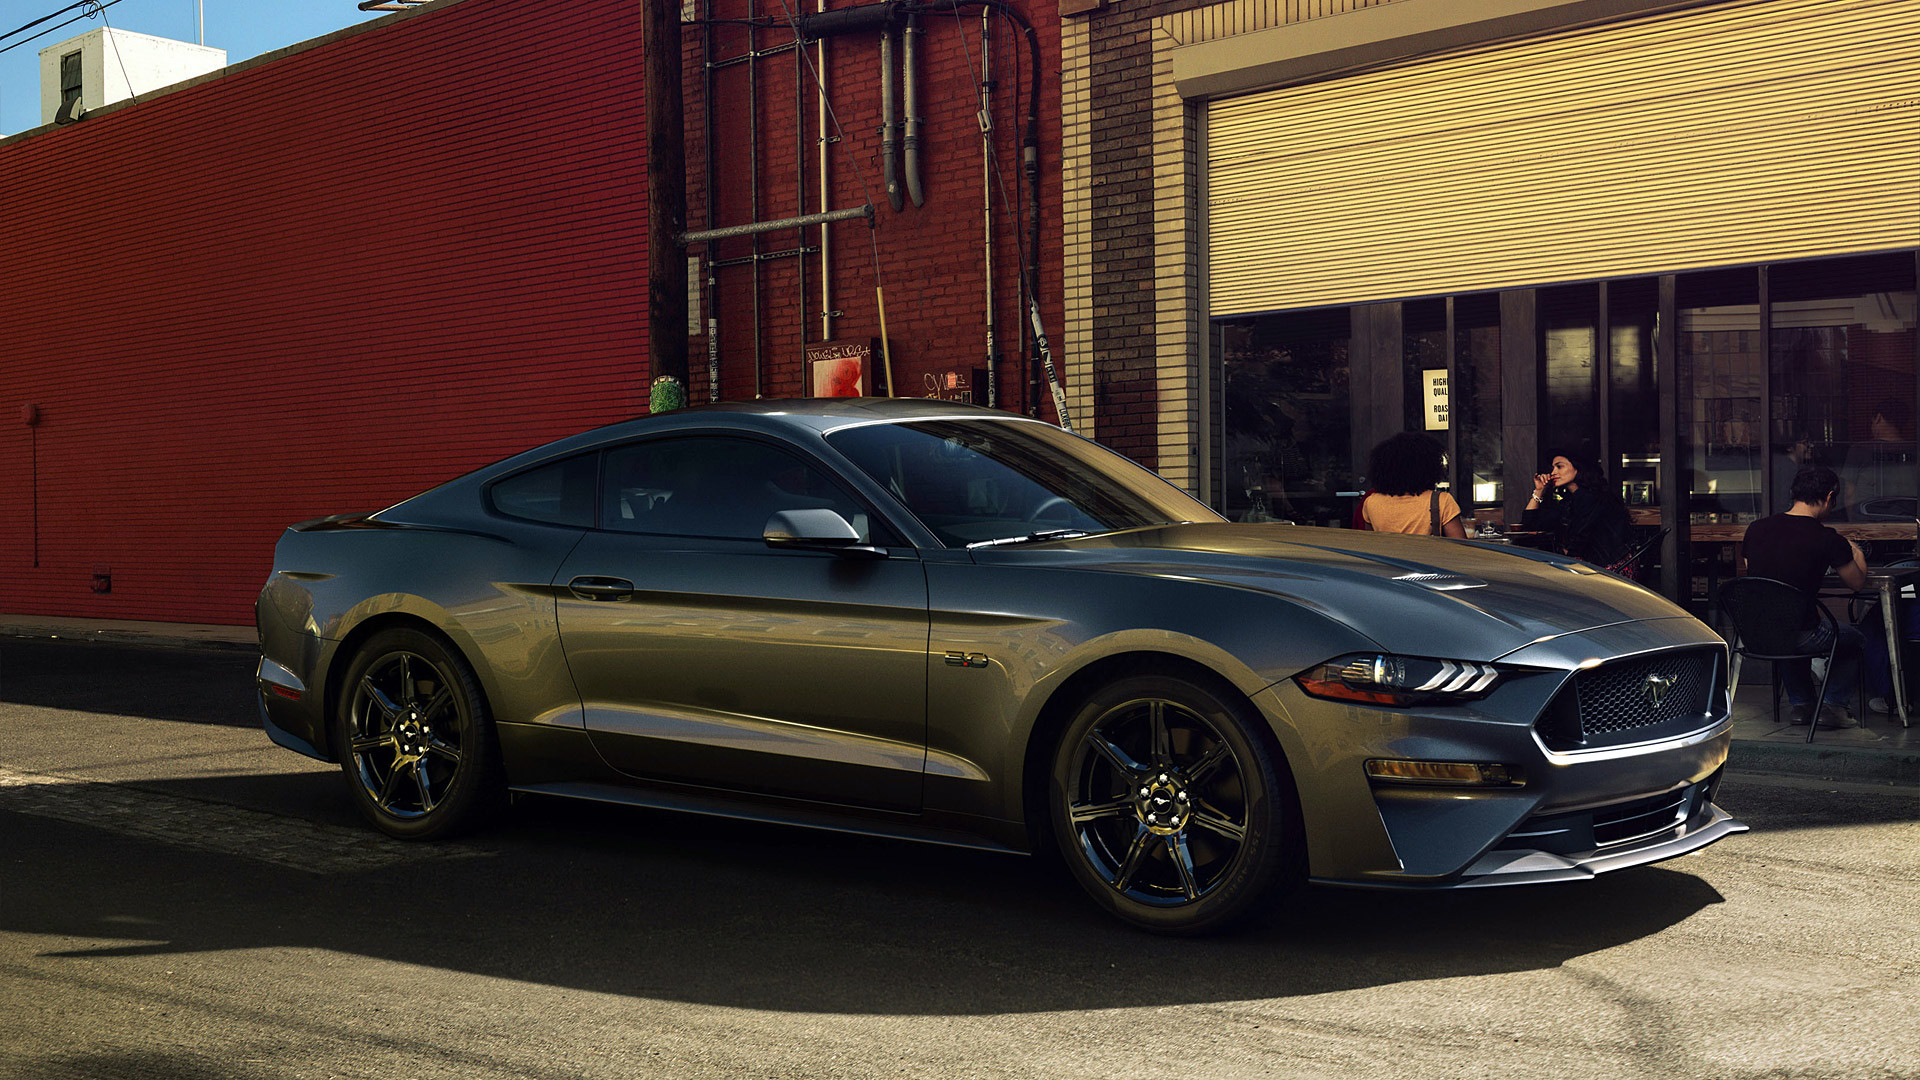 2018 Mustang Gt Wallpaper 57 Images